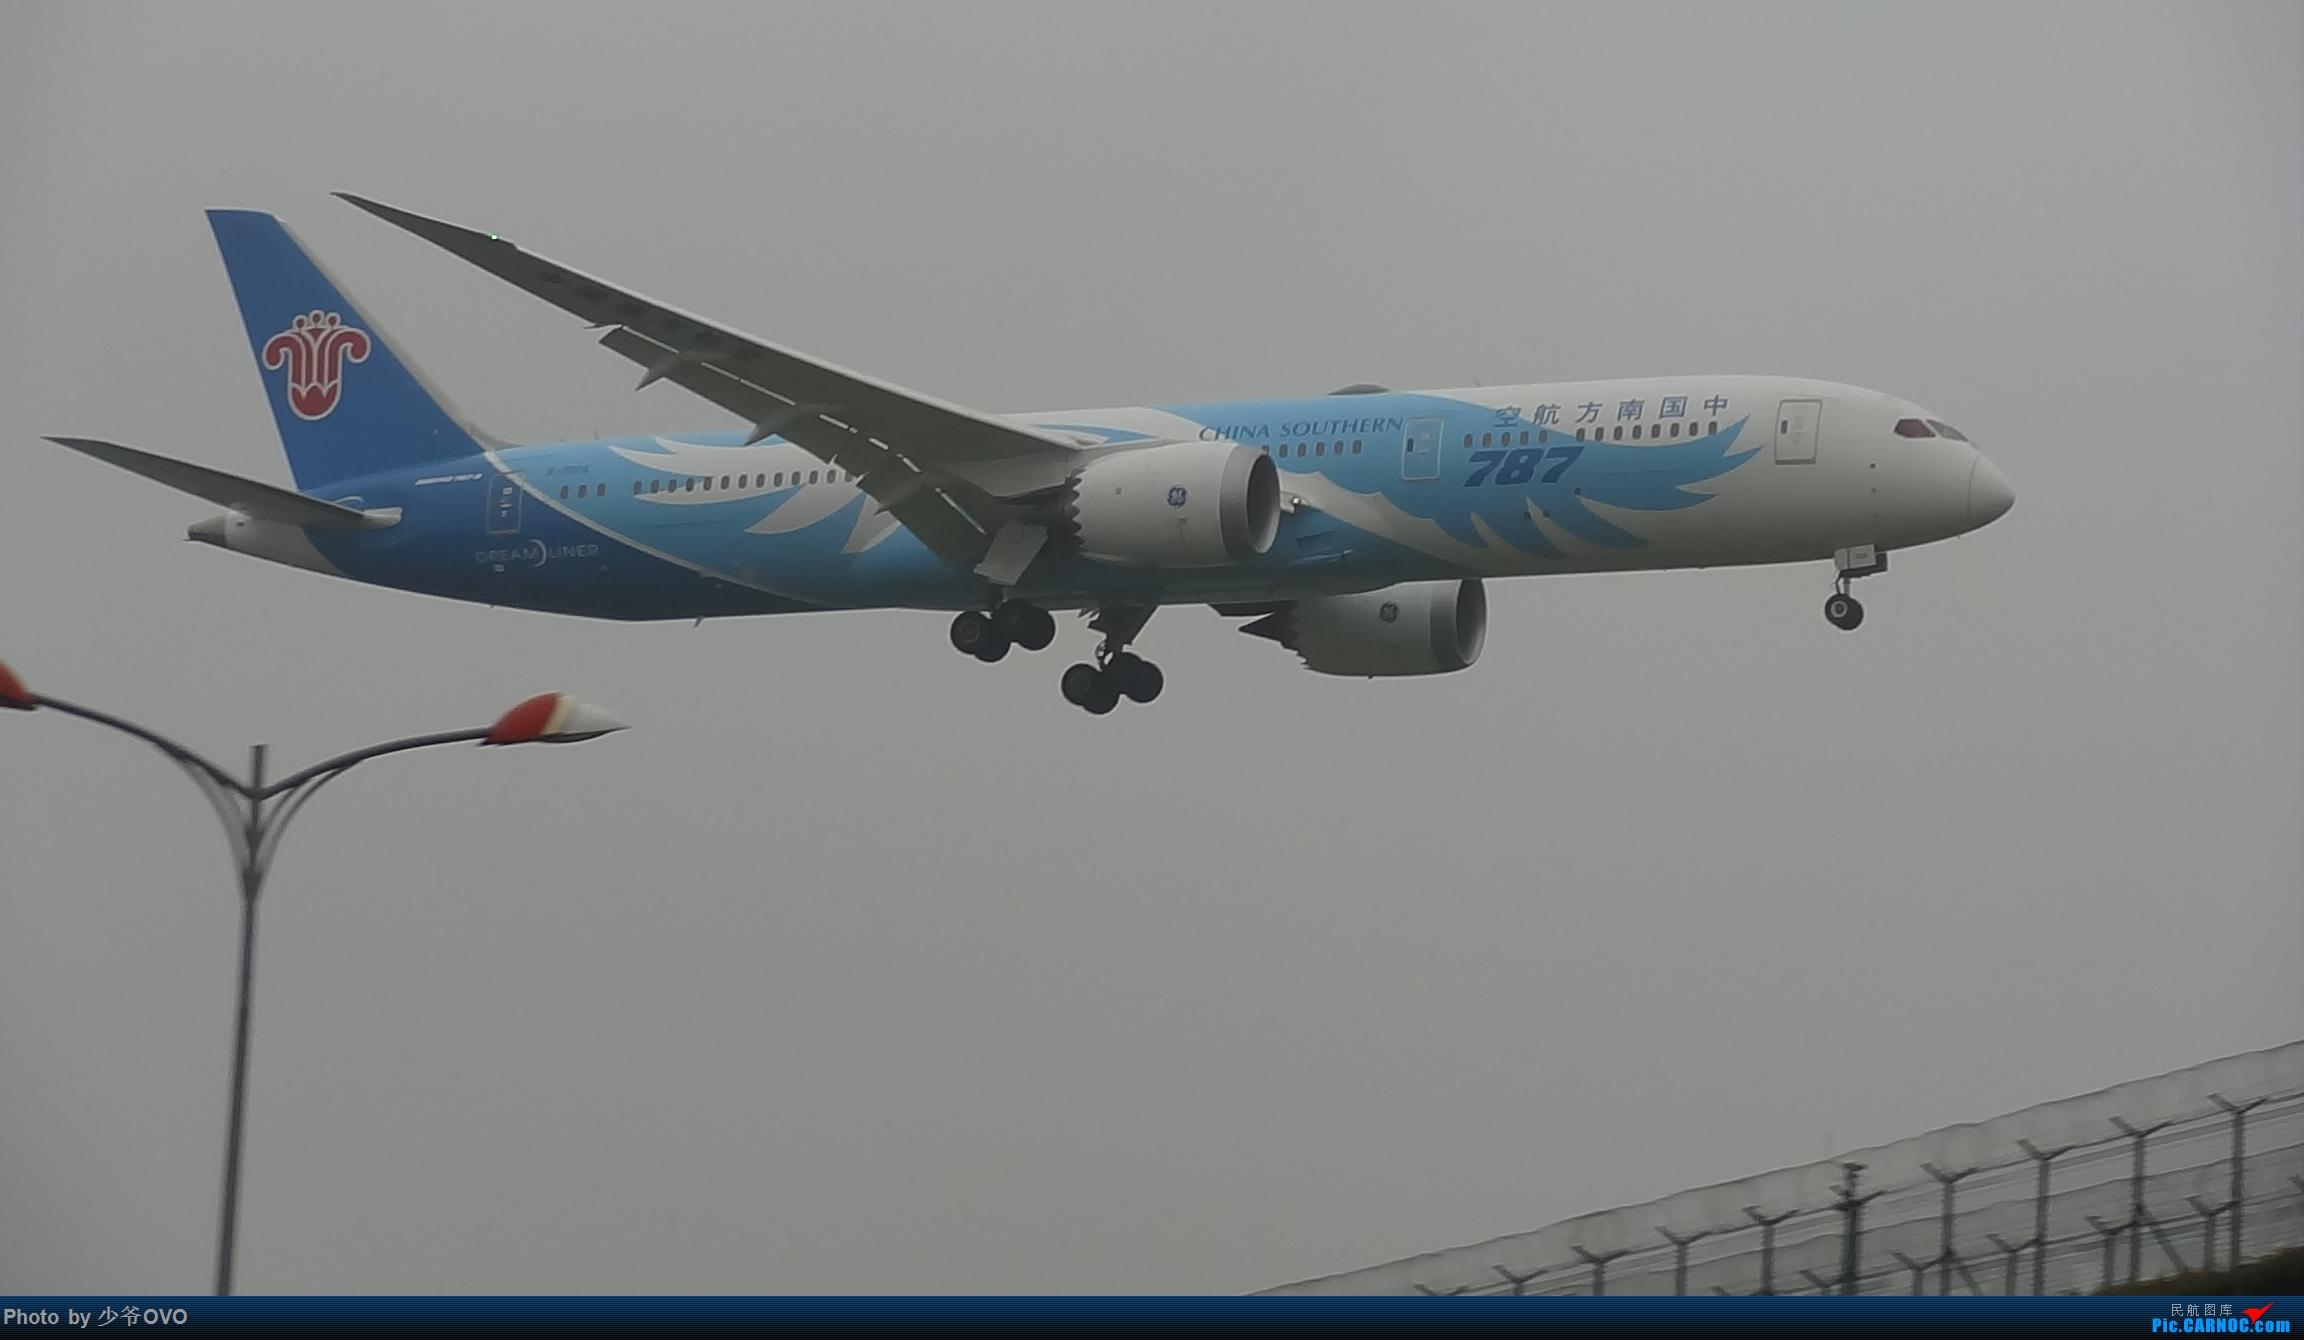 Re:[原创]CKG重庆江北机场拍机 ,渣图一堆,多指点 BOEING 787  中国重庆江北国际机场